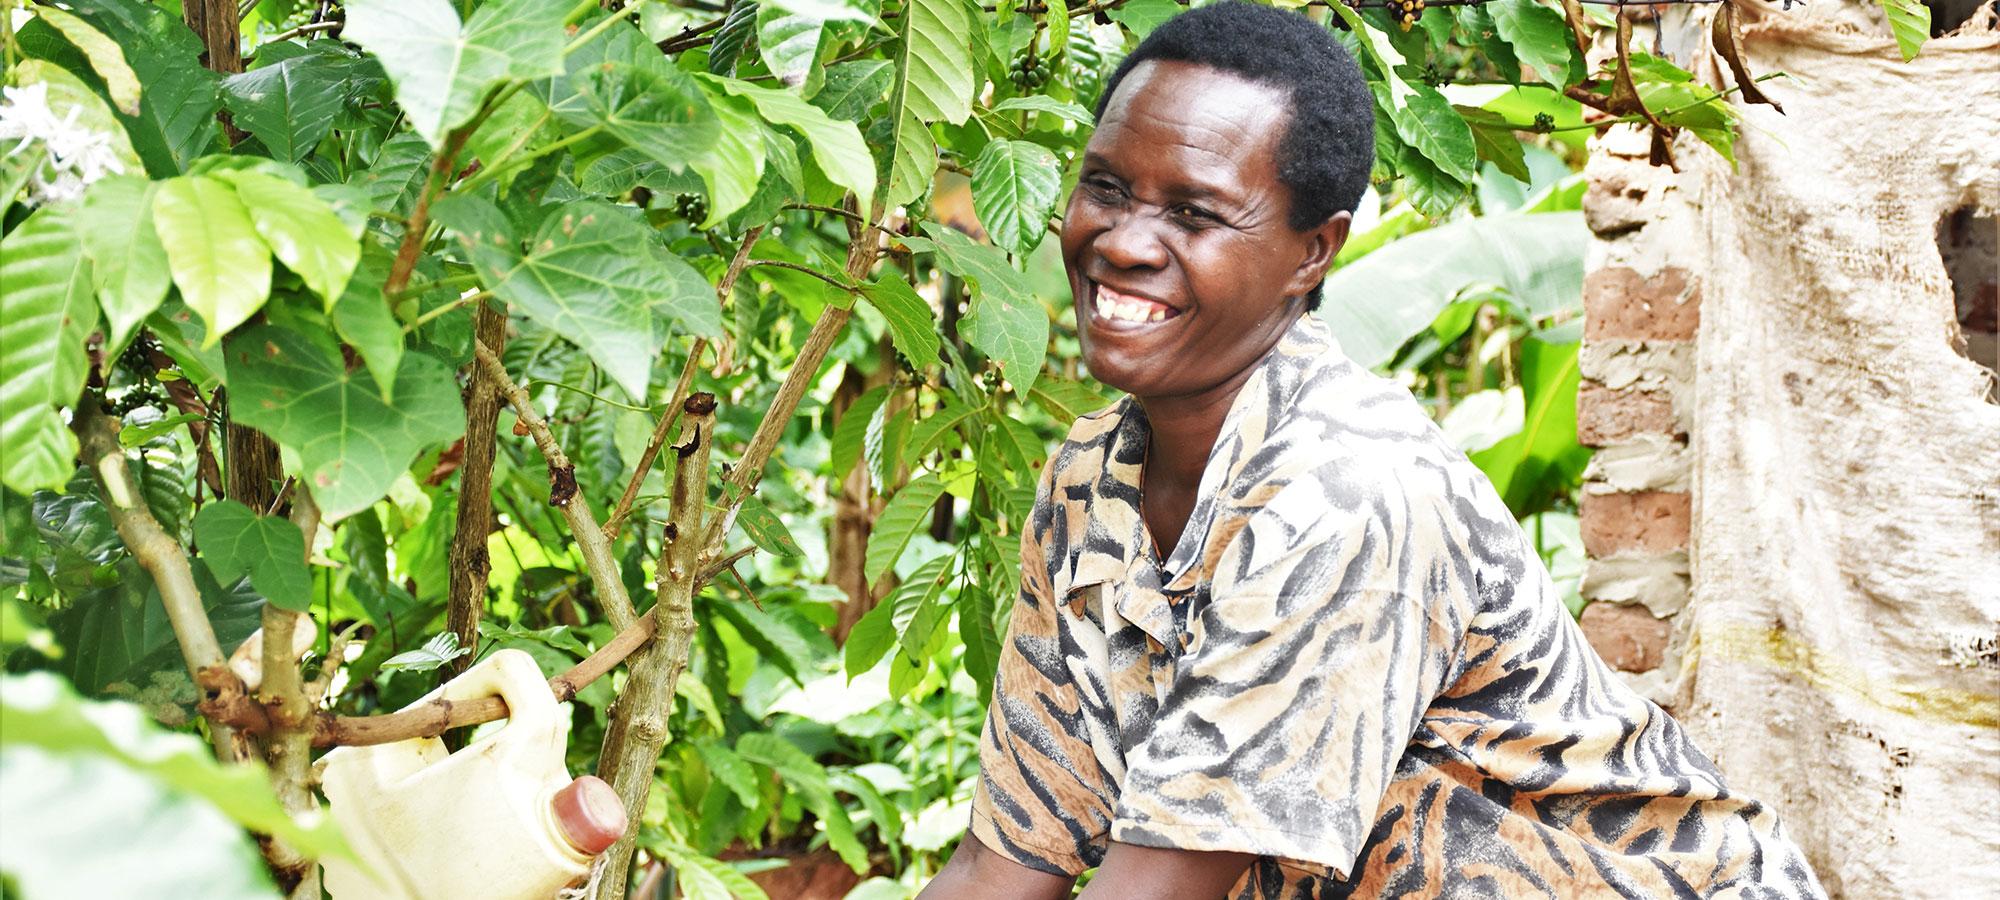 Promoting good hand hygiene in rural Uganda